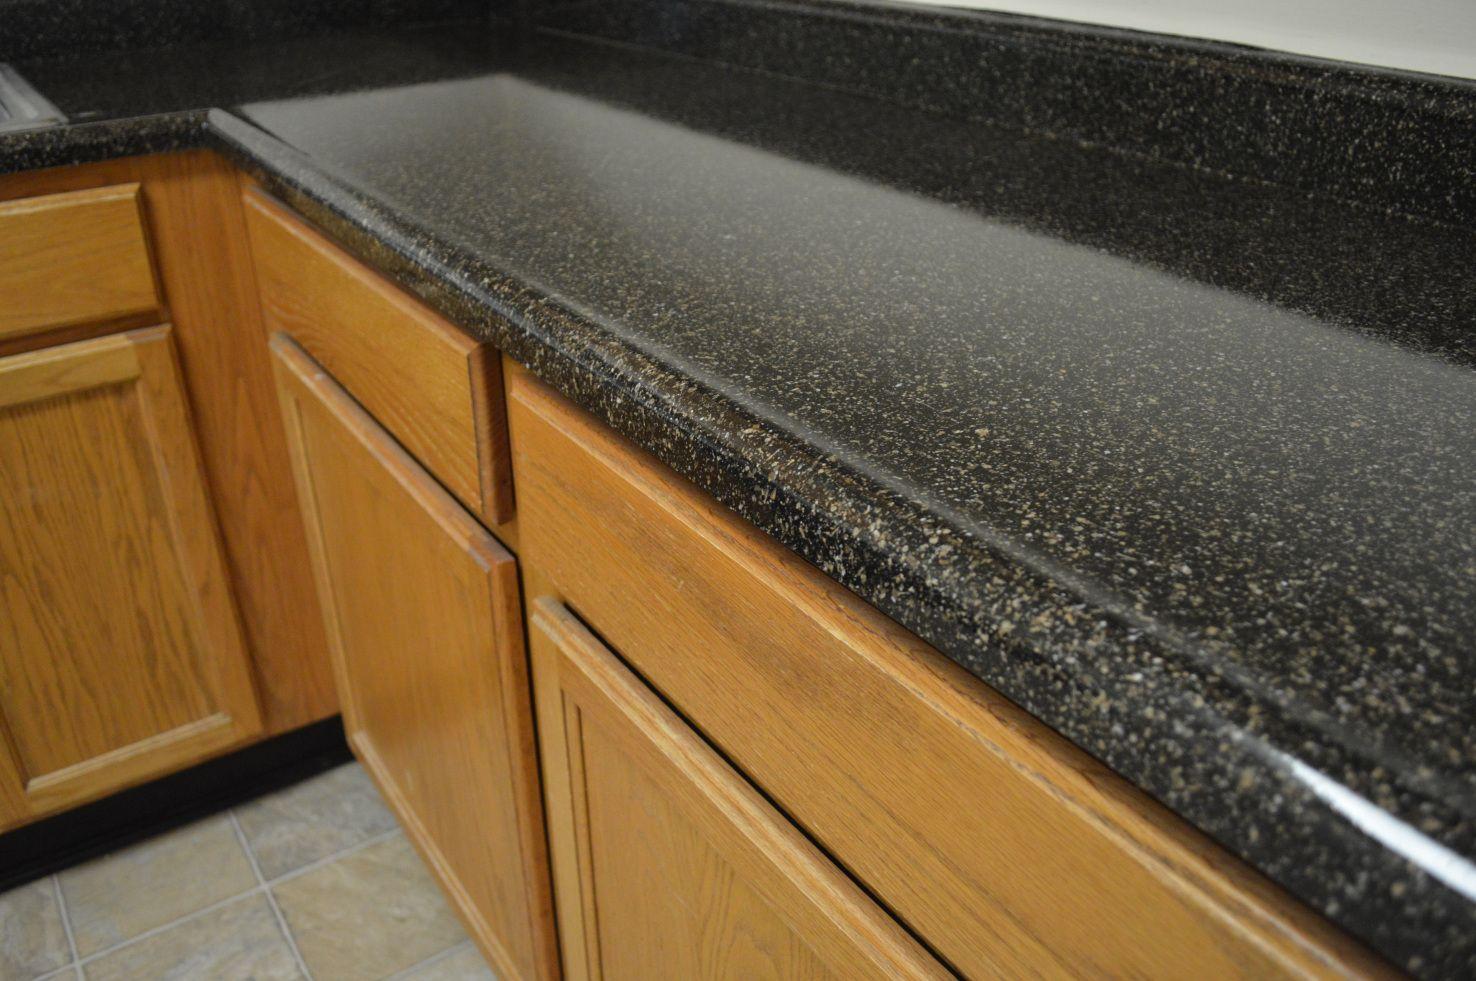 2019 Refinishing Granite Countertops   Corner Kitchen Cupboard Ideas Check  More At Http://